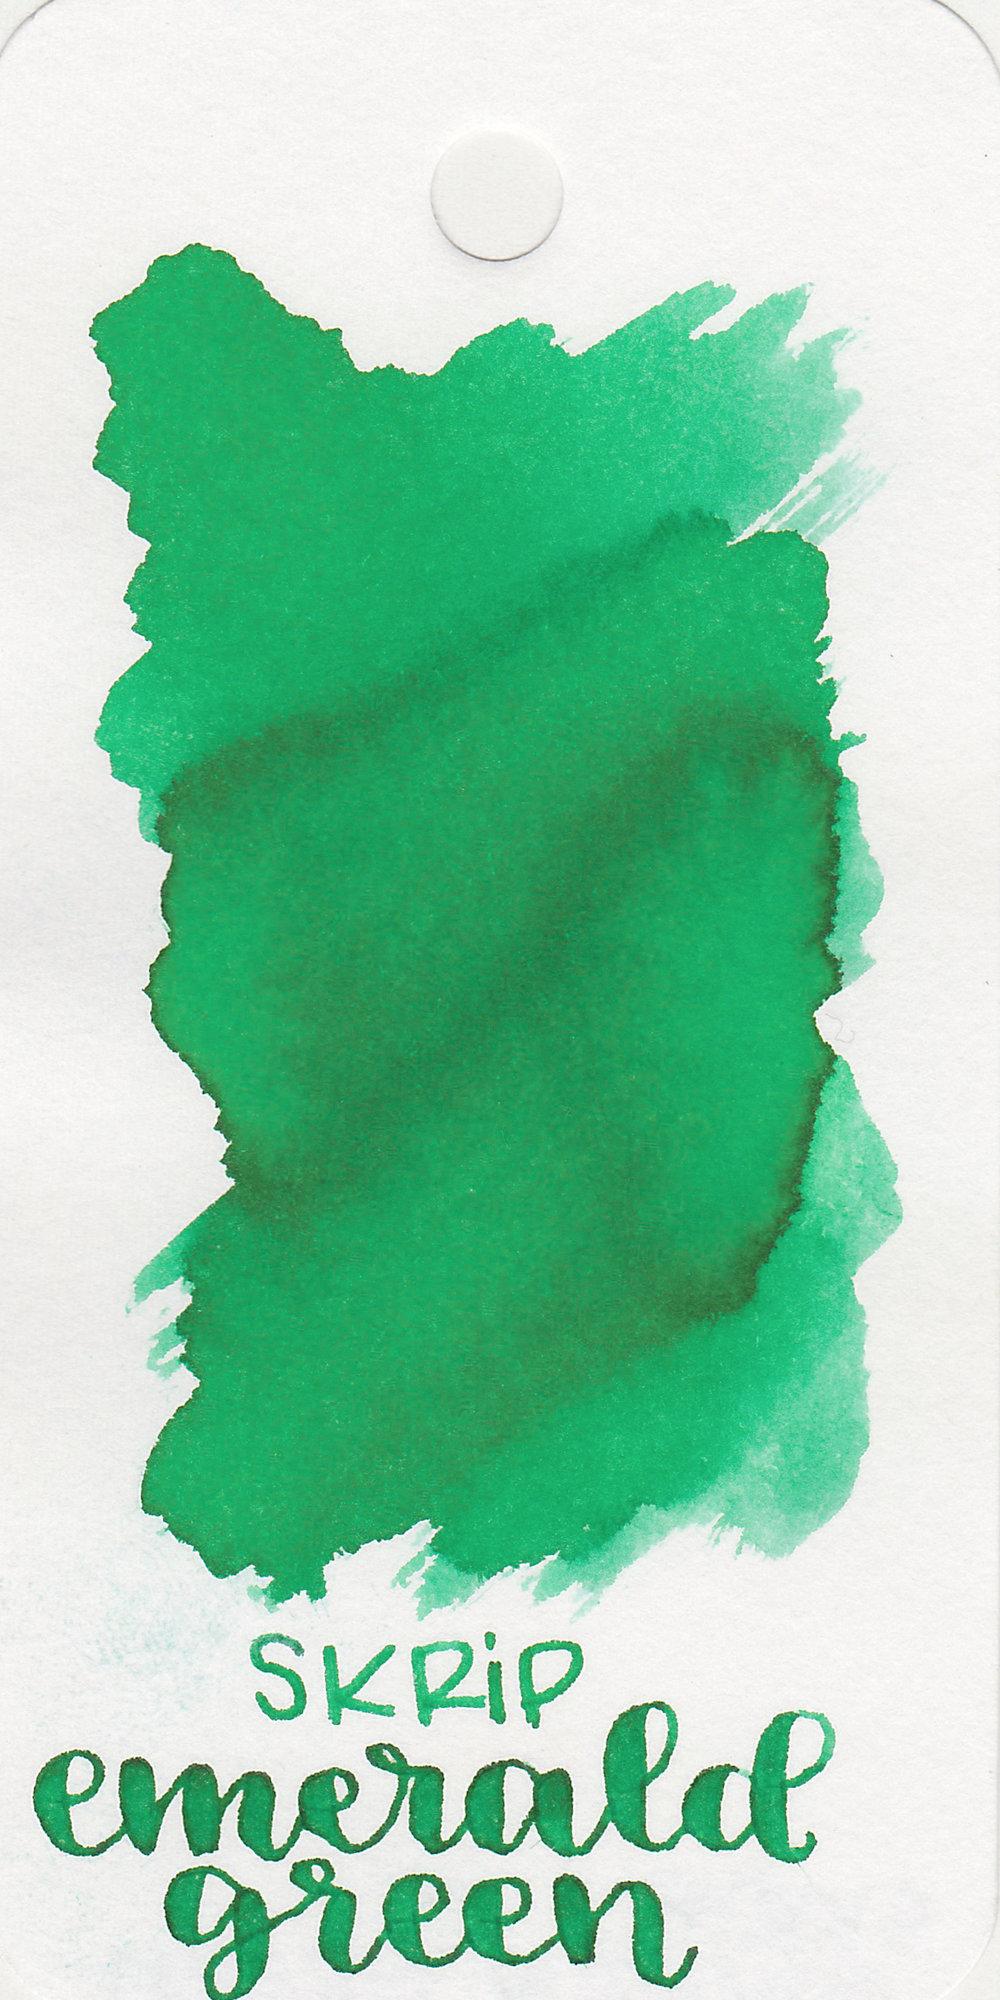 skr-emerald-green-1.jpg